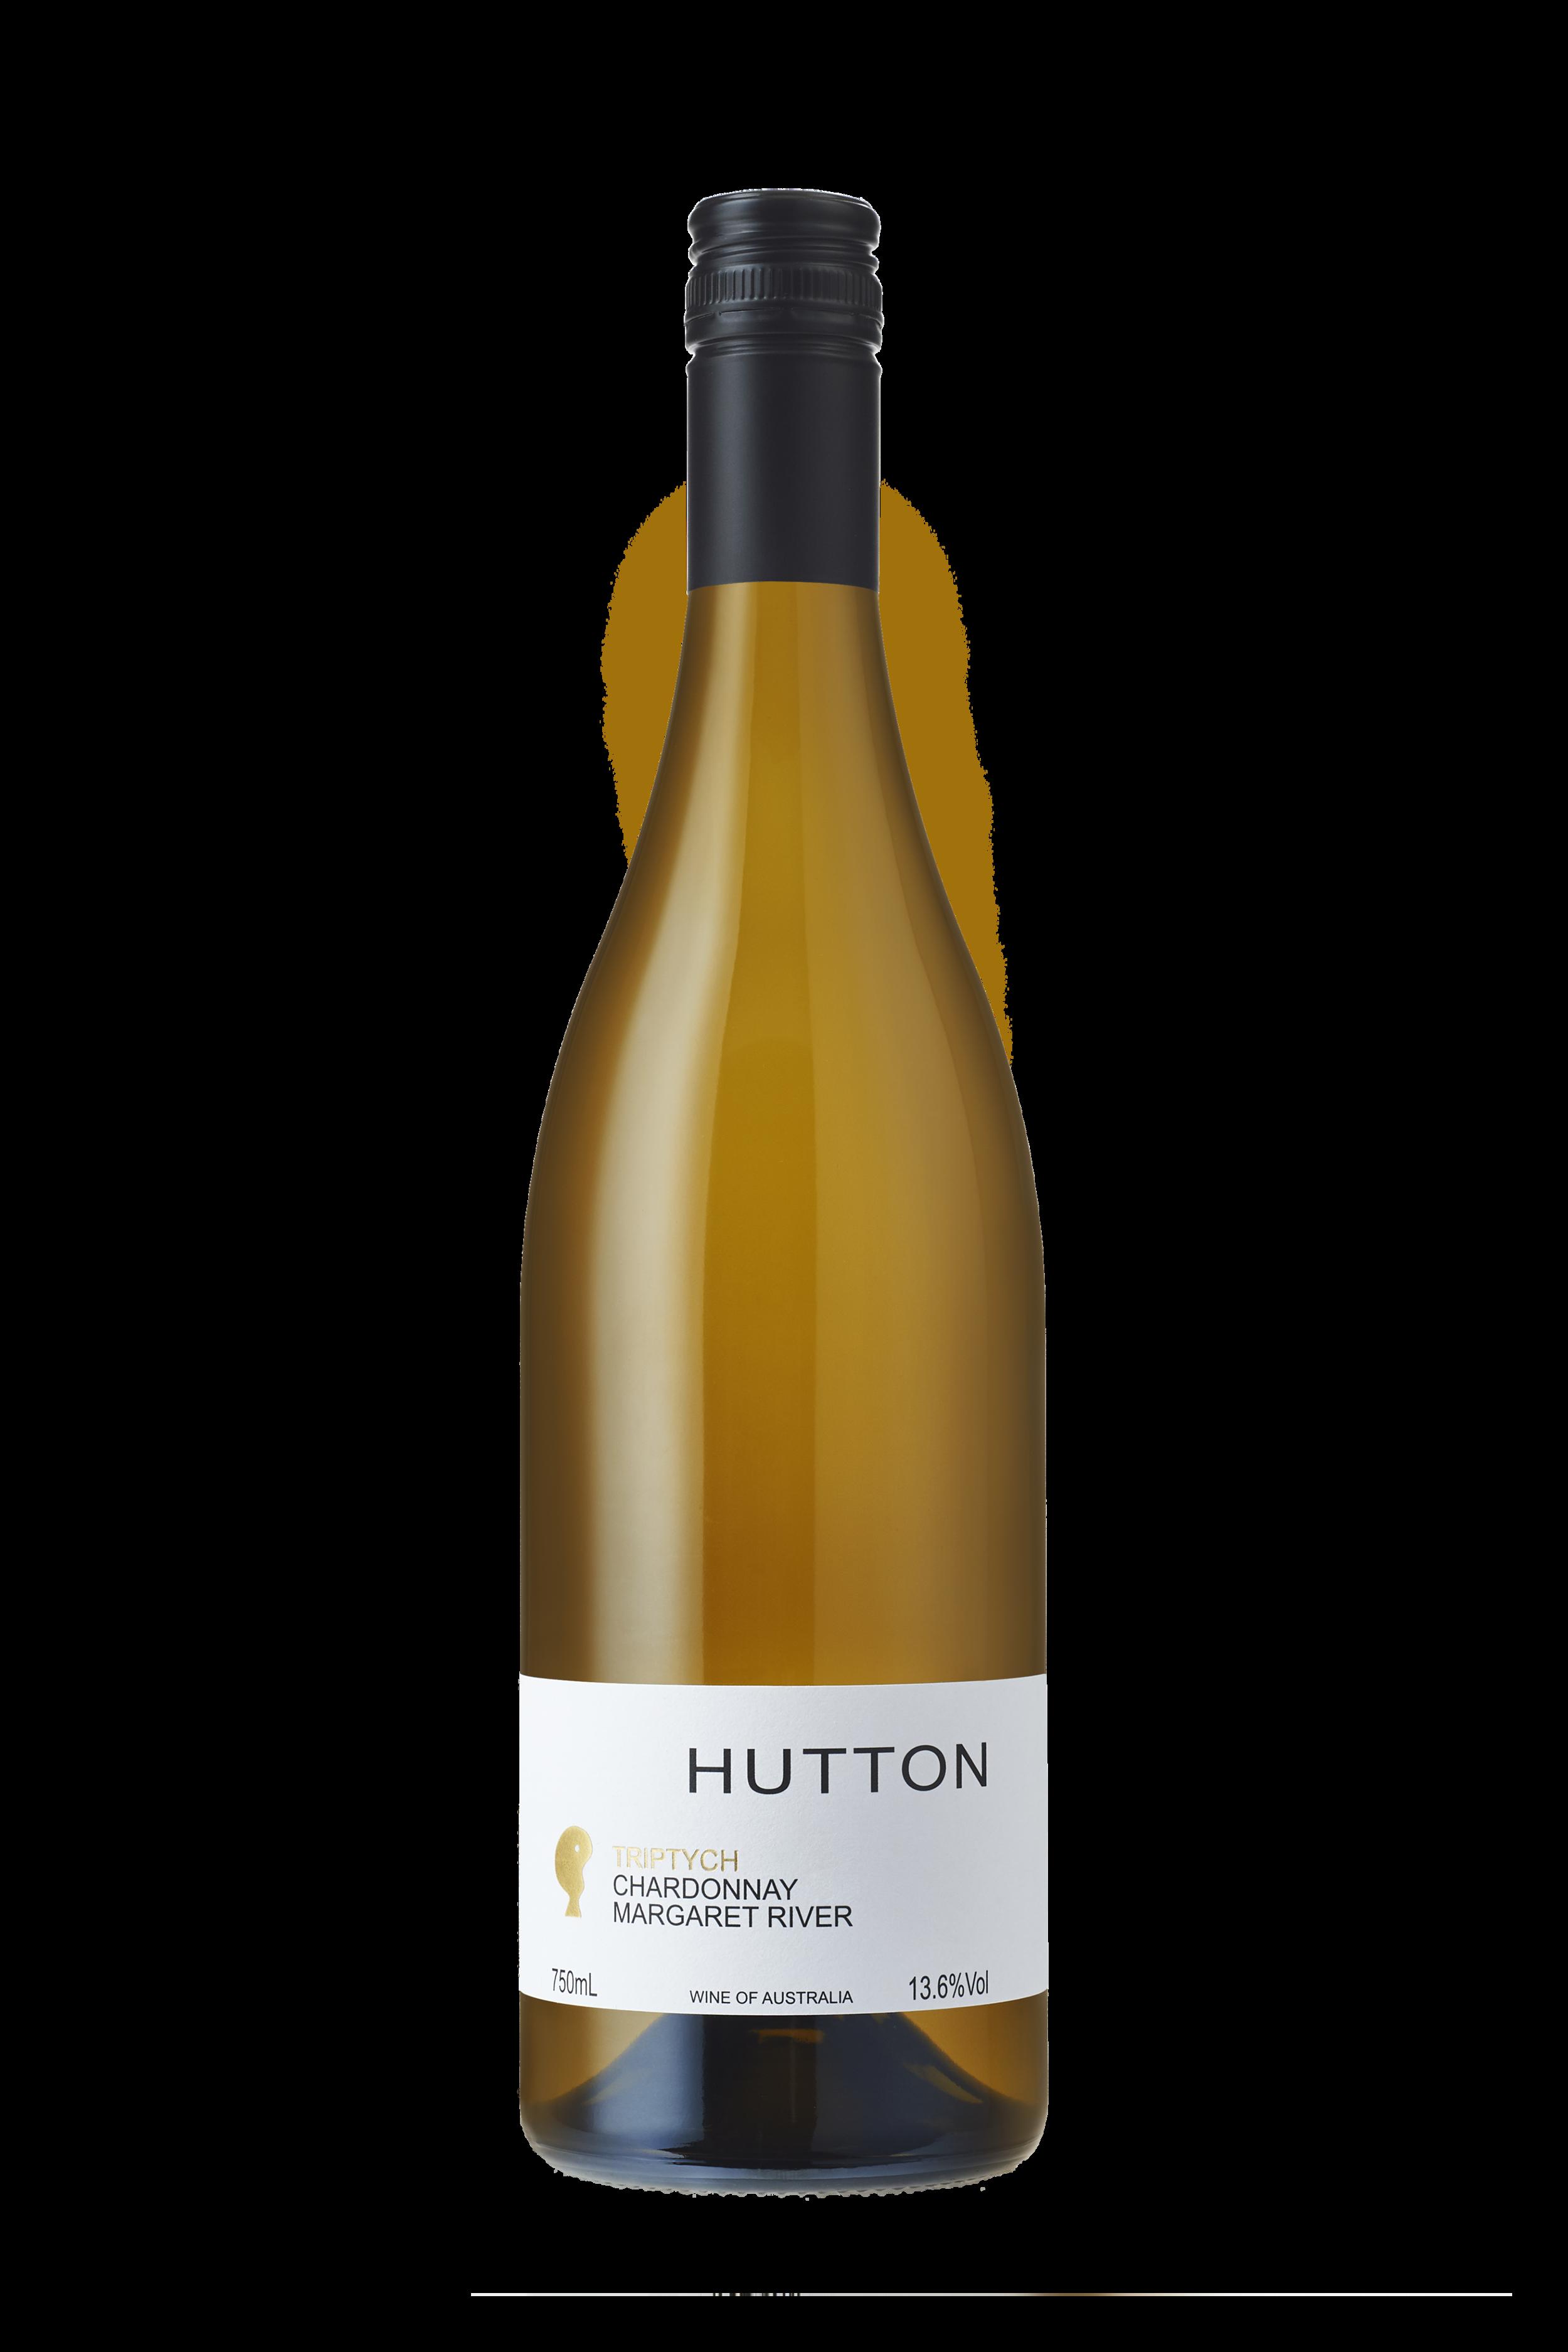 Hutton Triptych CHARDONNAY 2018